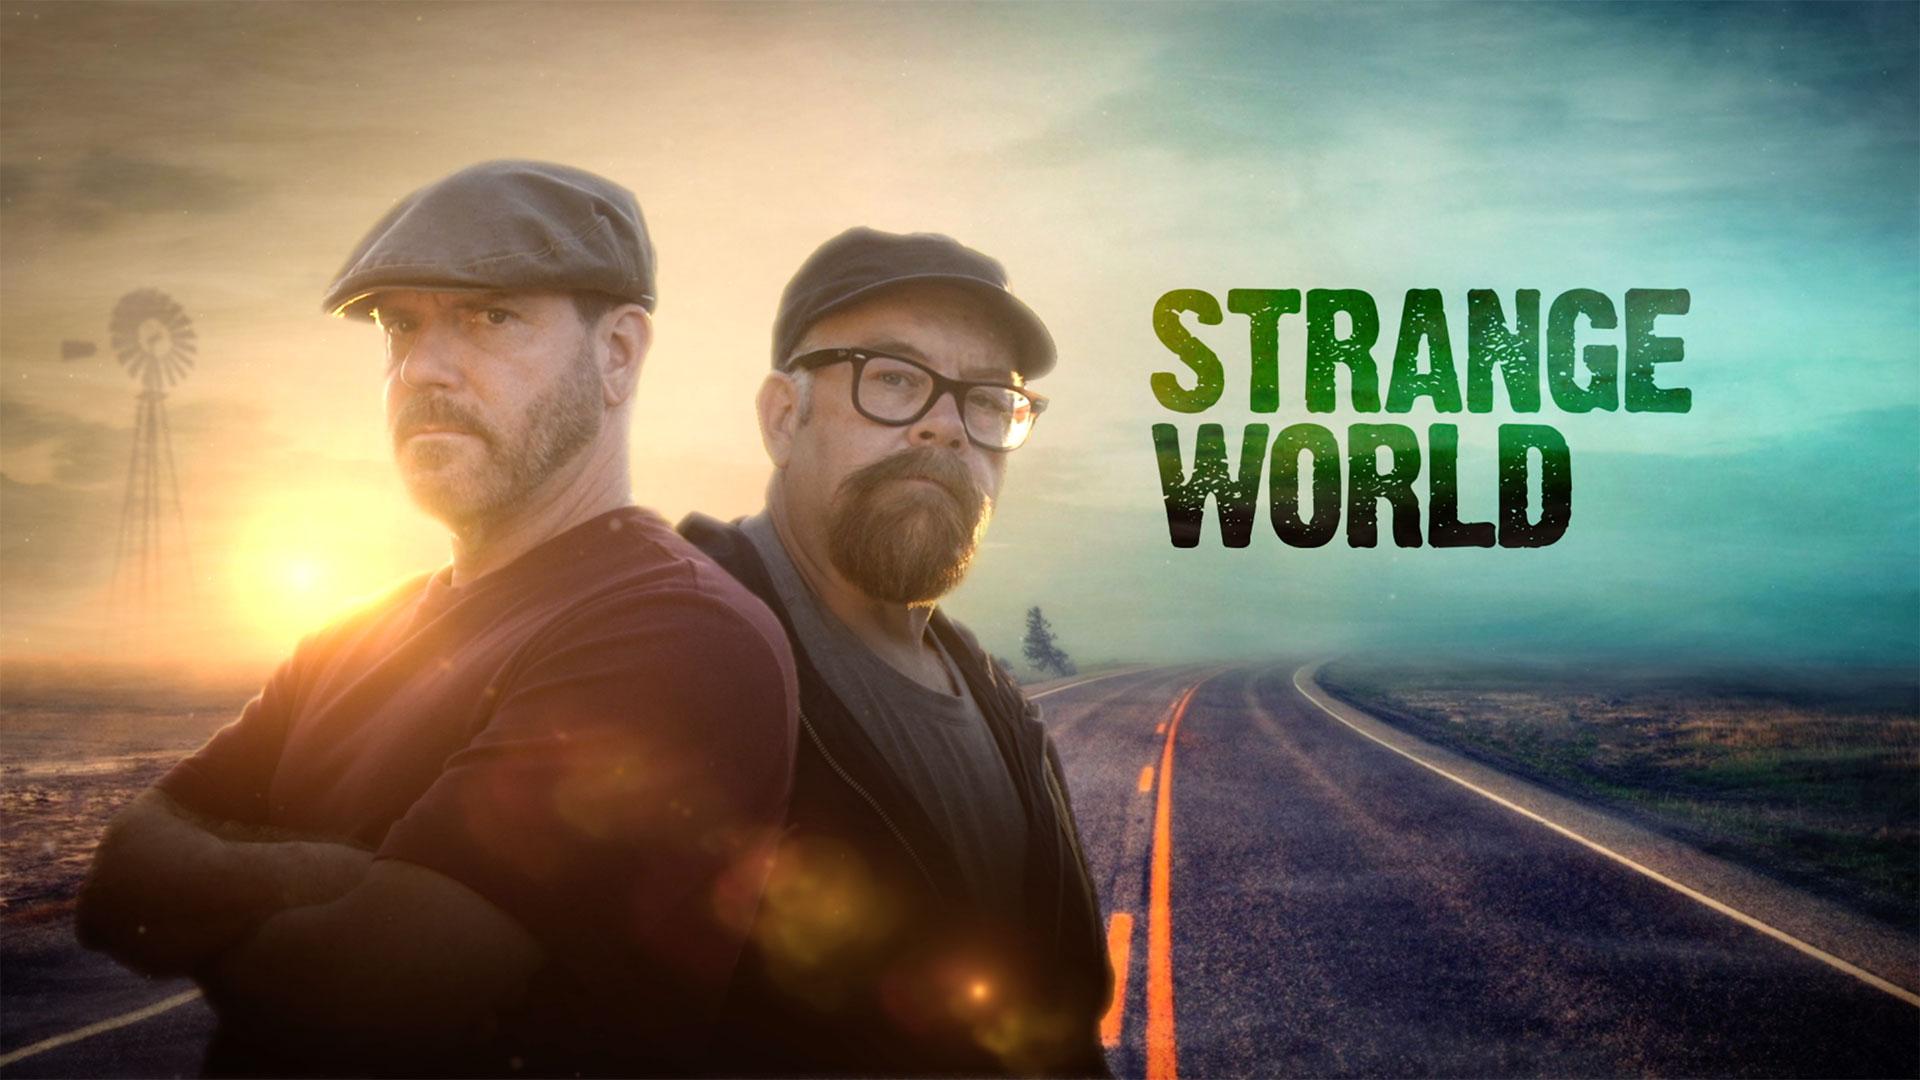 Strange World ©Holey&Moley